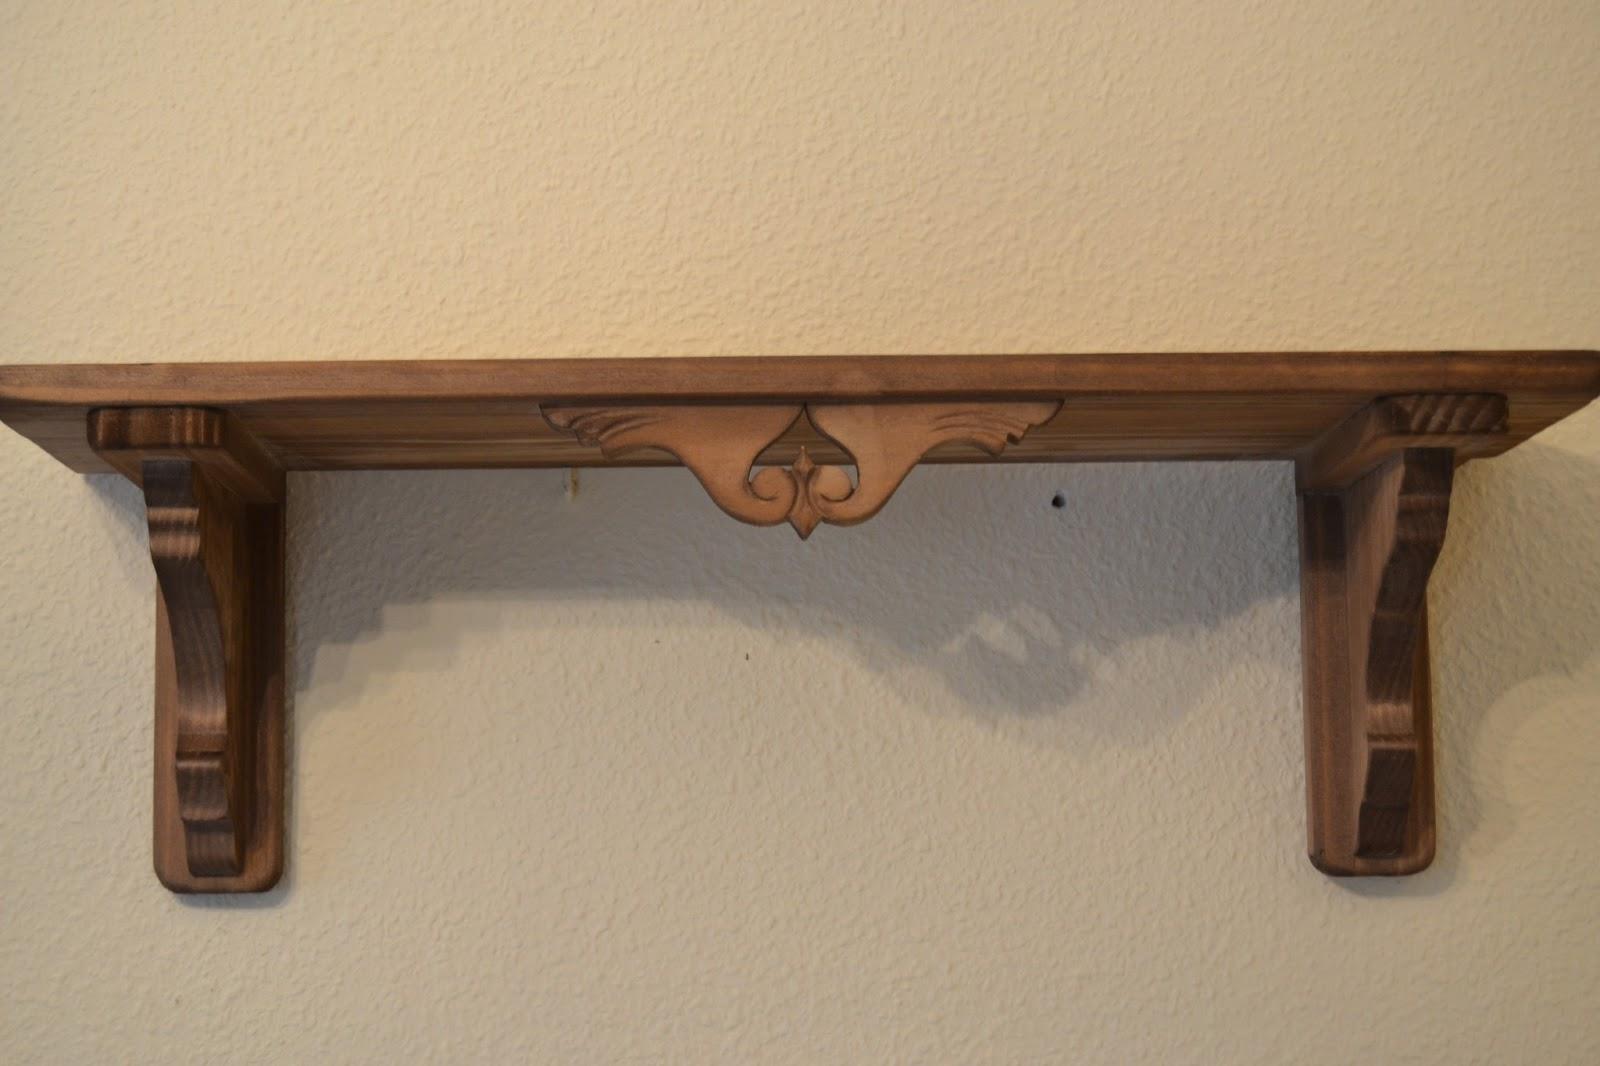 artesana en madera